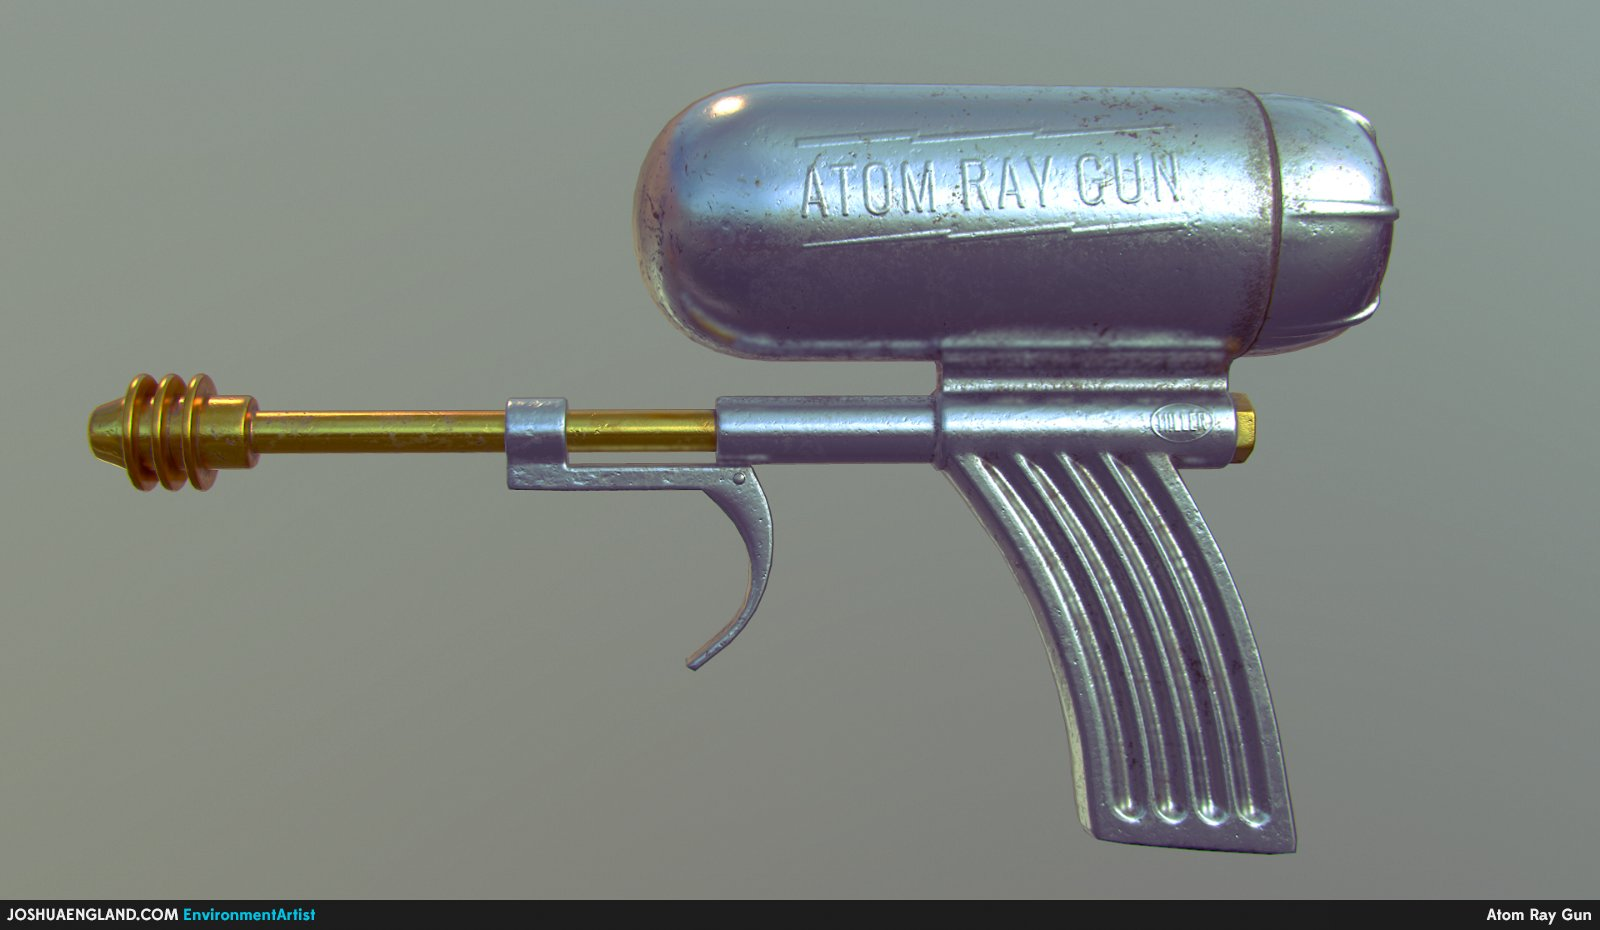 Atom Ray Gun Profile